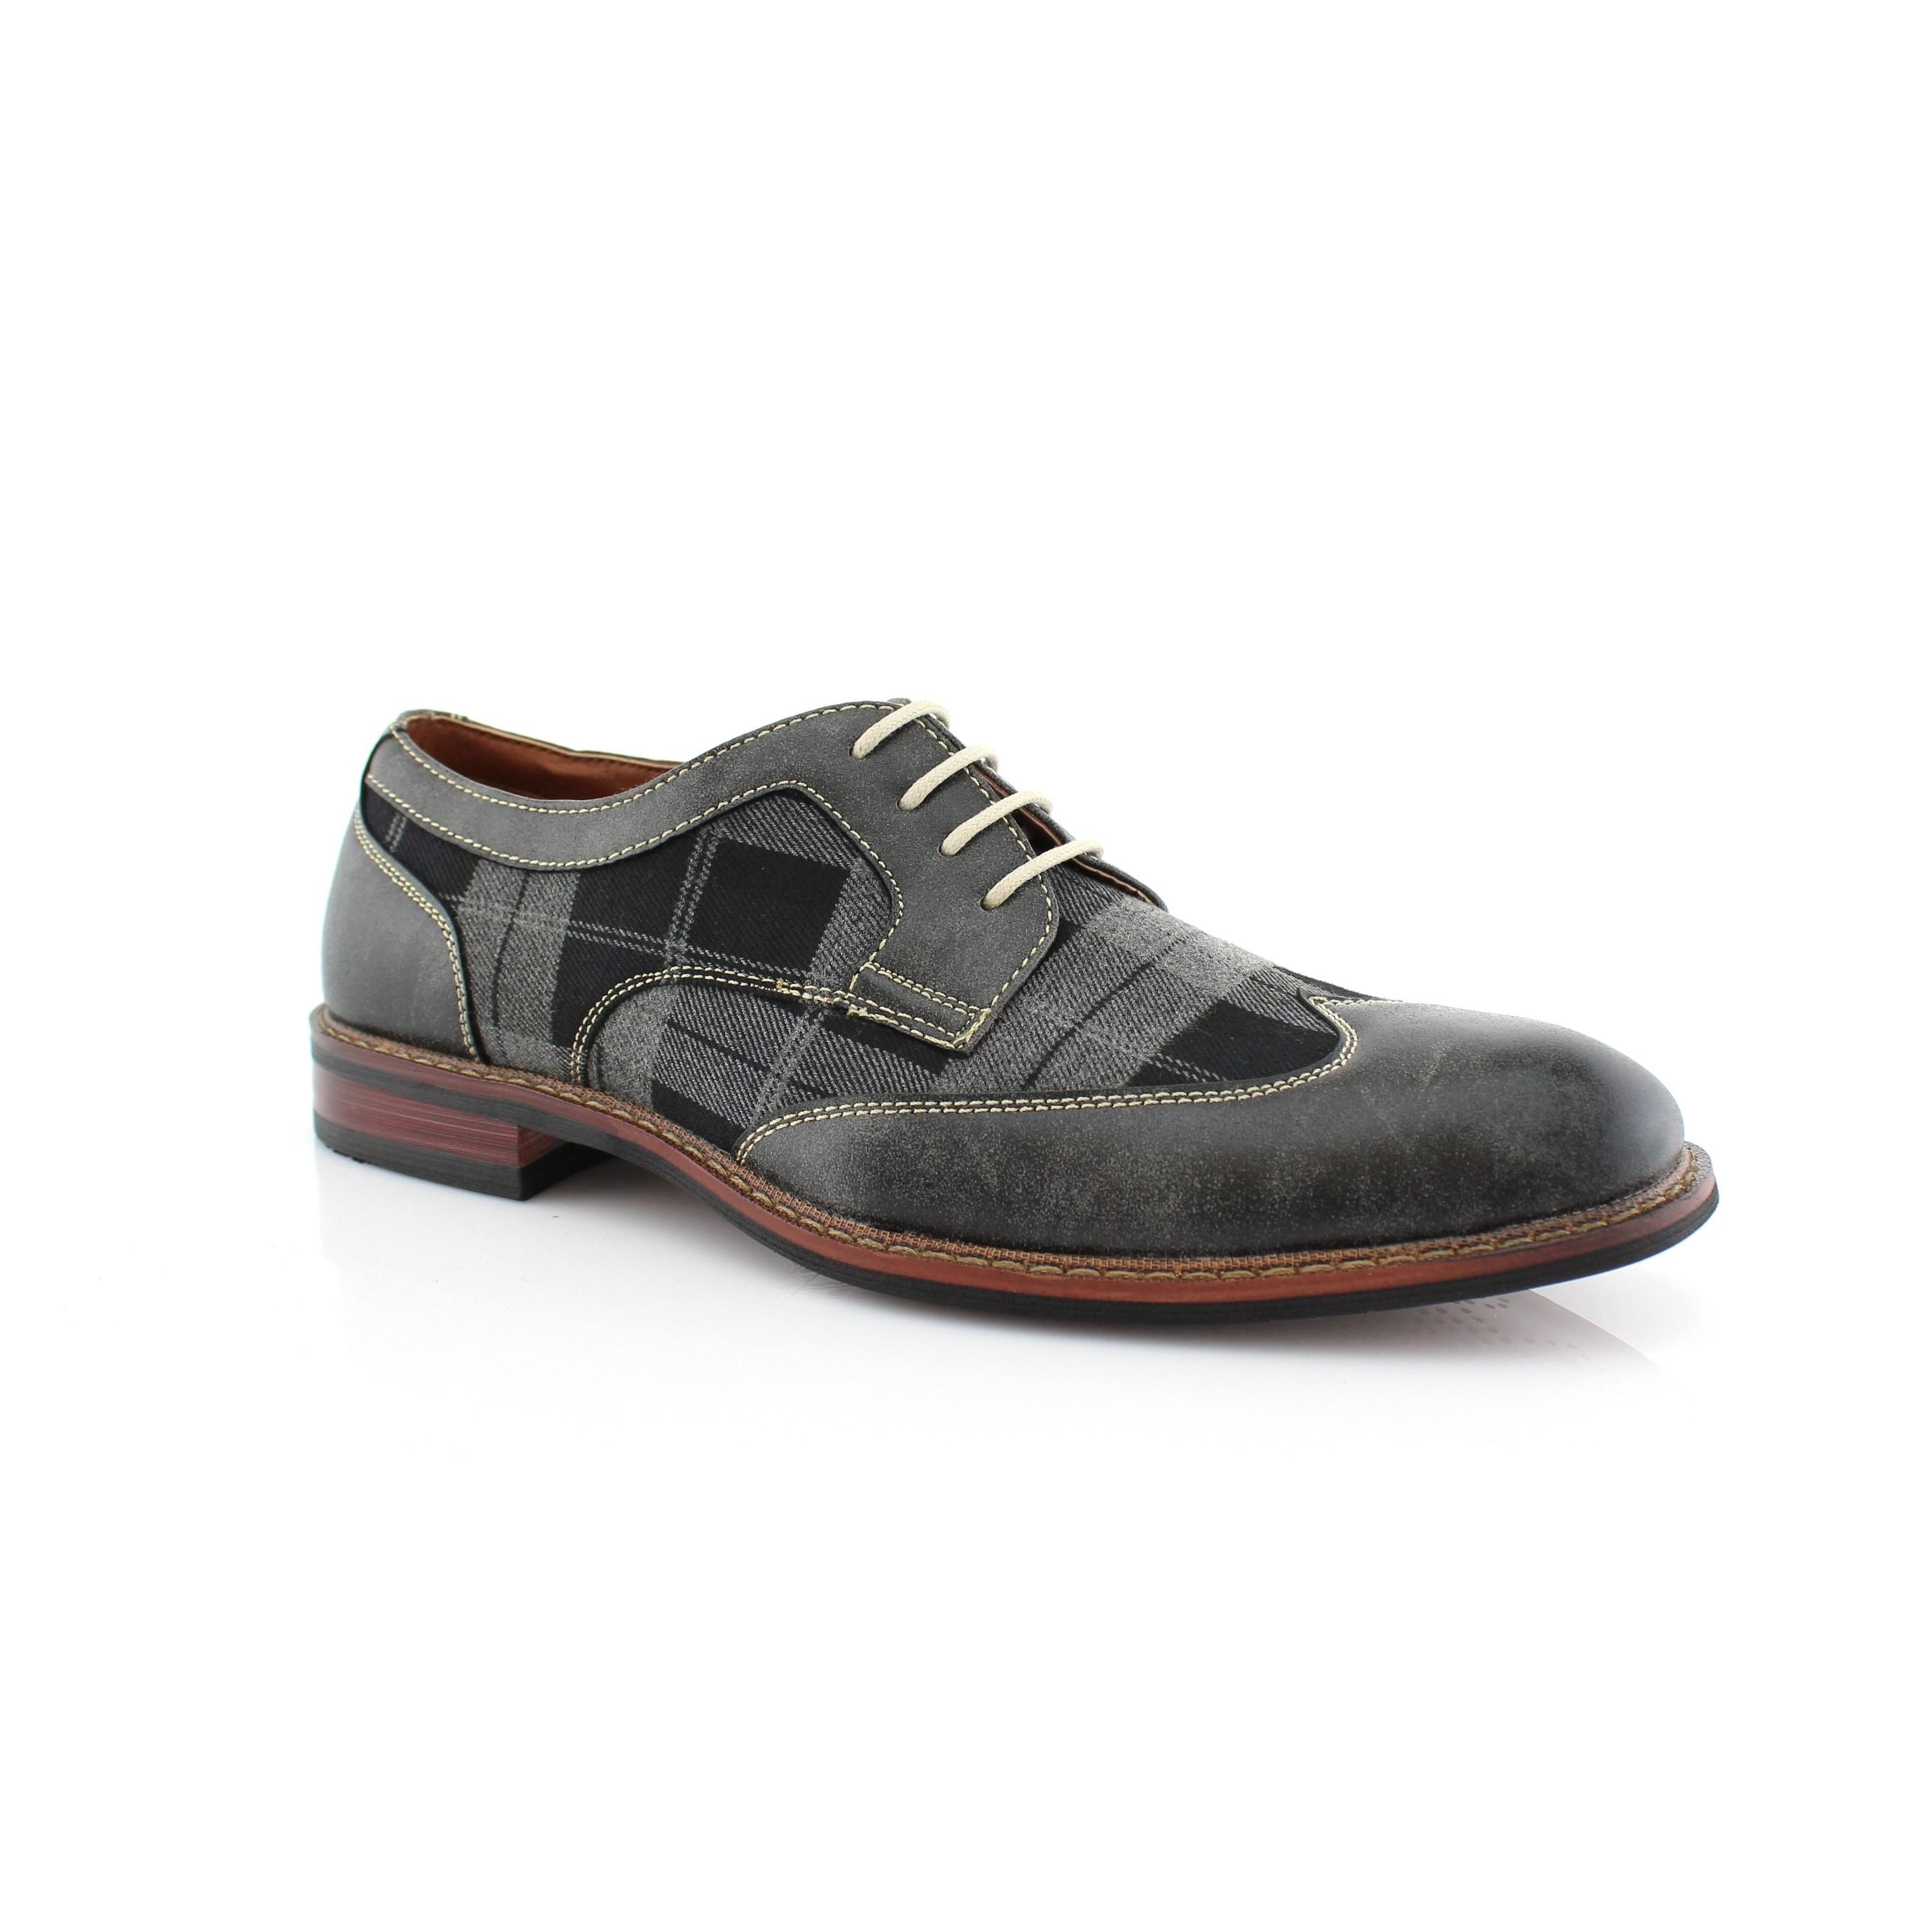 Wingtip Oxfords Dress Shoes